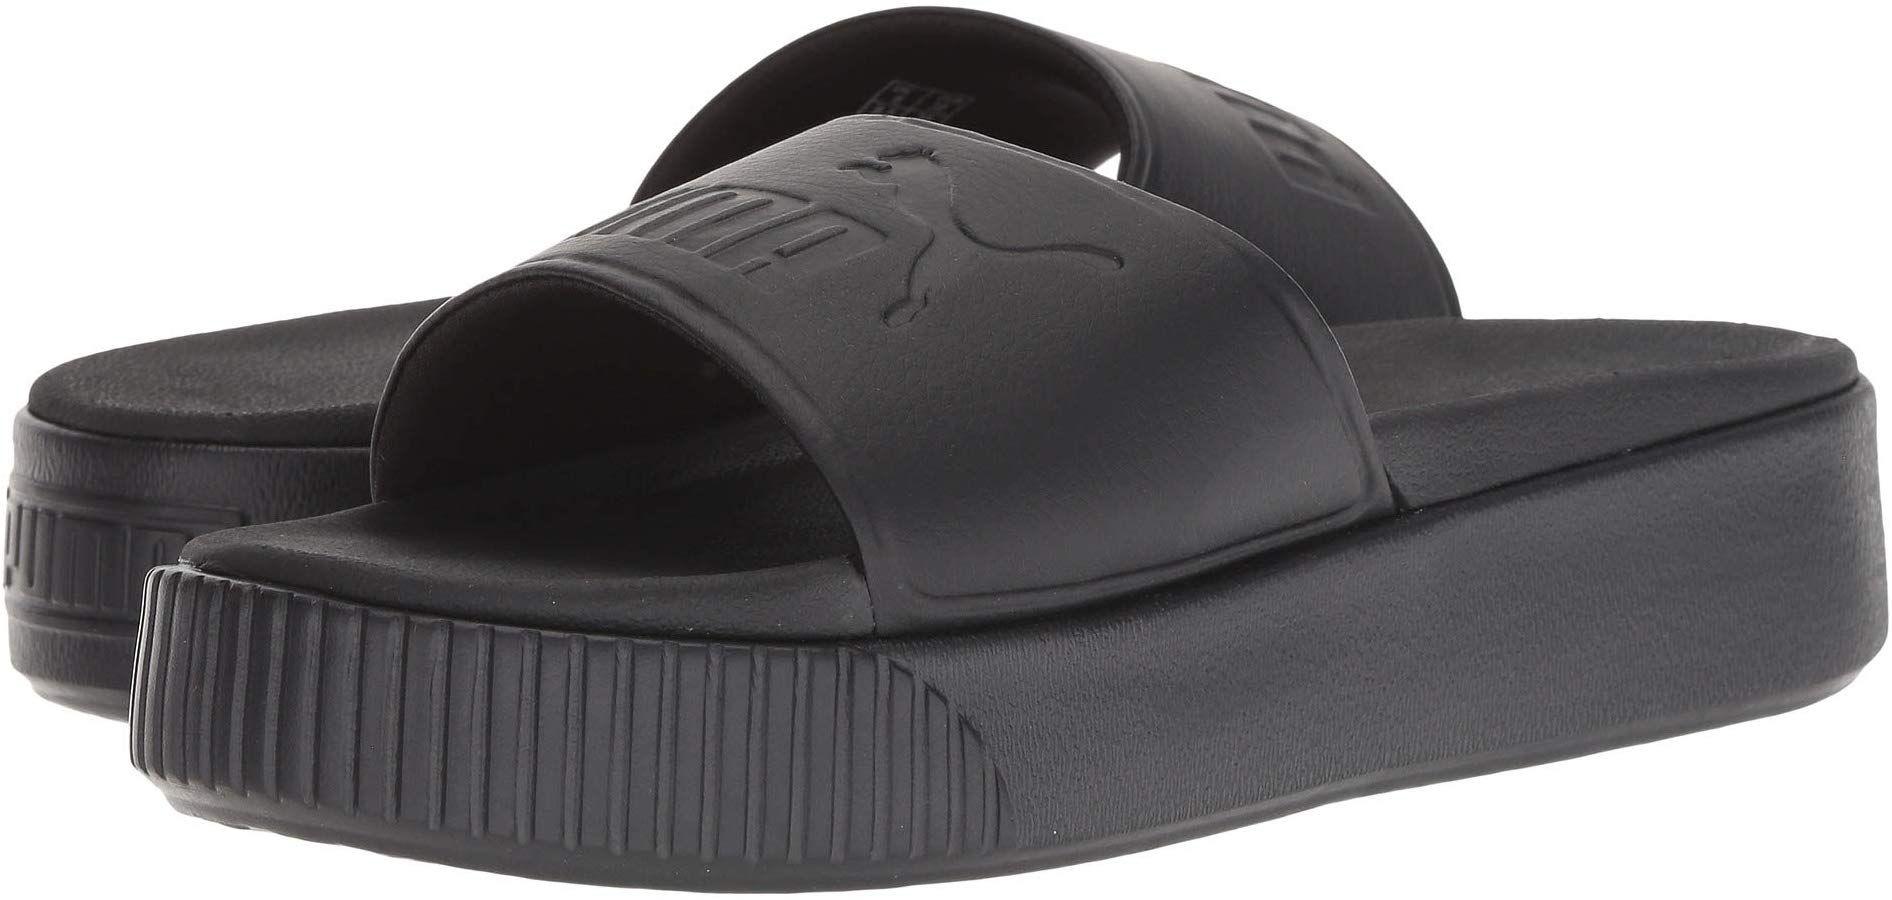 f756f89e22 Generic Platform Slide Bold - Women Sandal Price in Egypt | Jumia ...